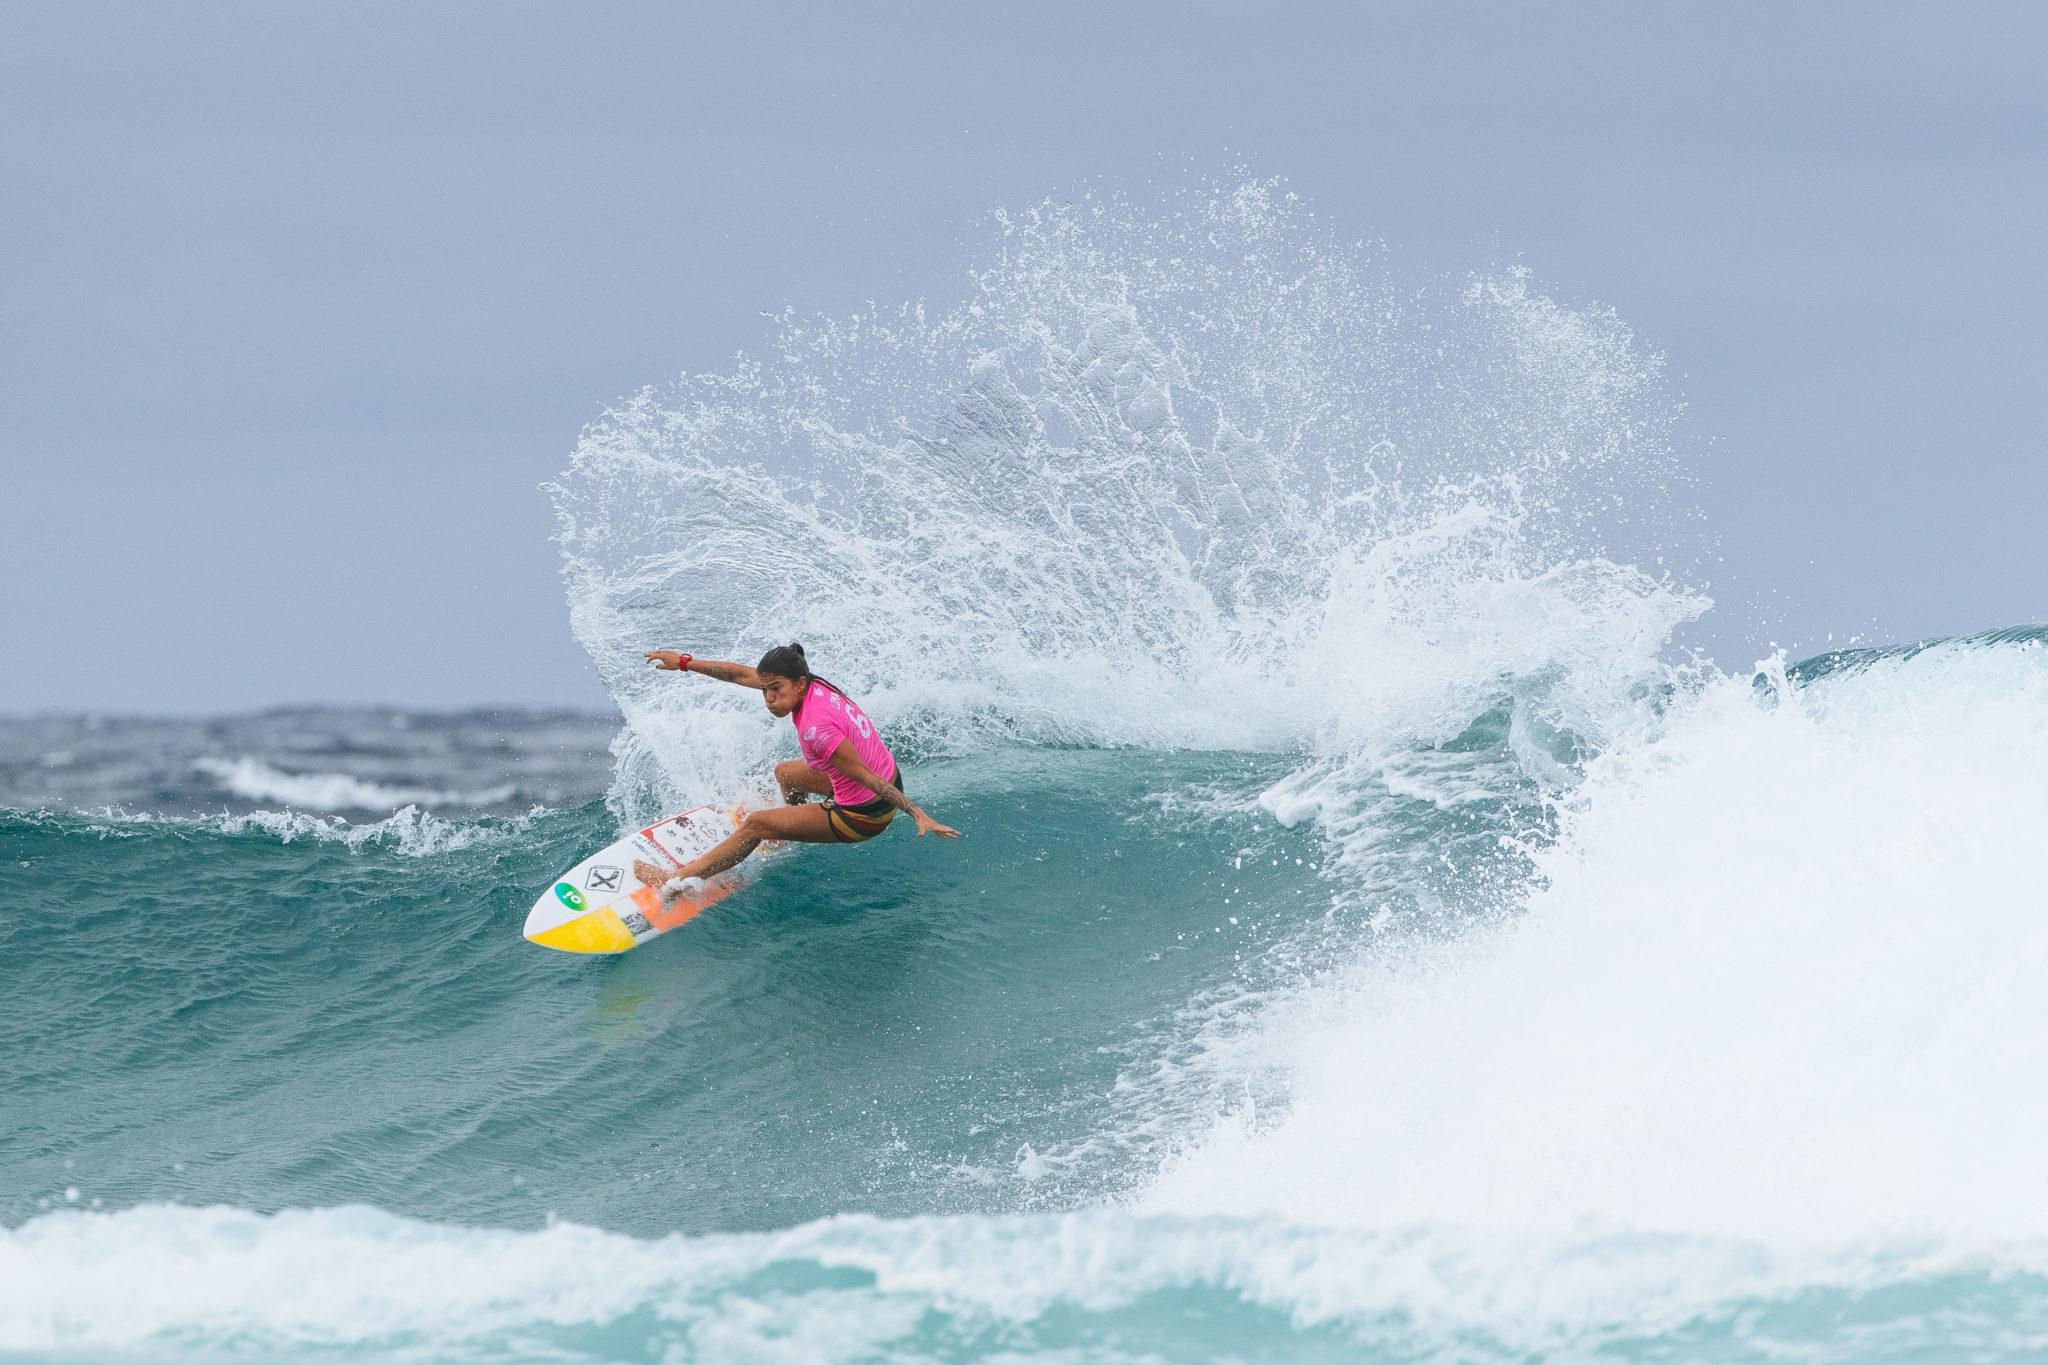 Silvana Lima freesurfing.